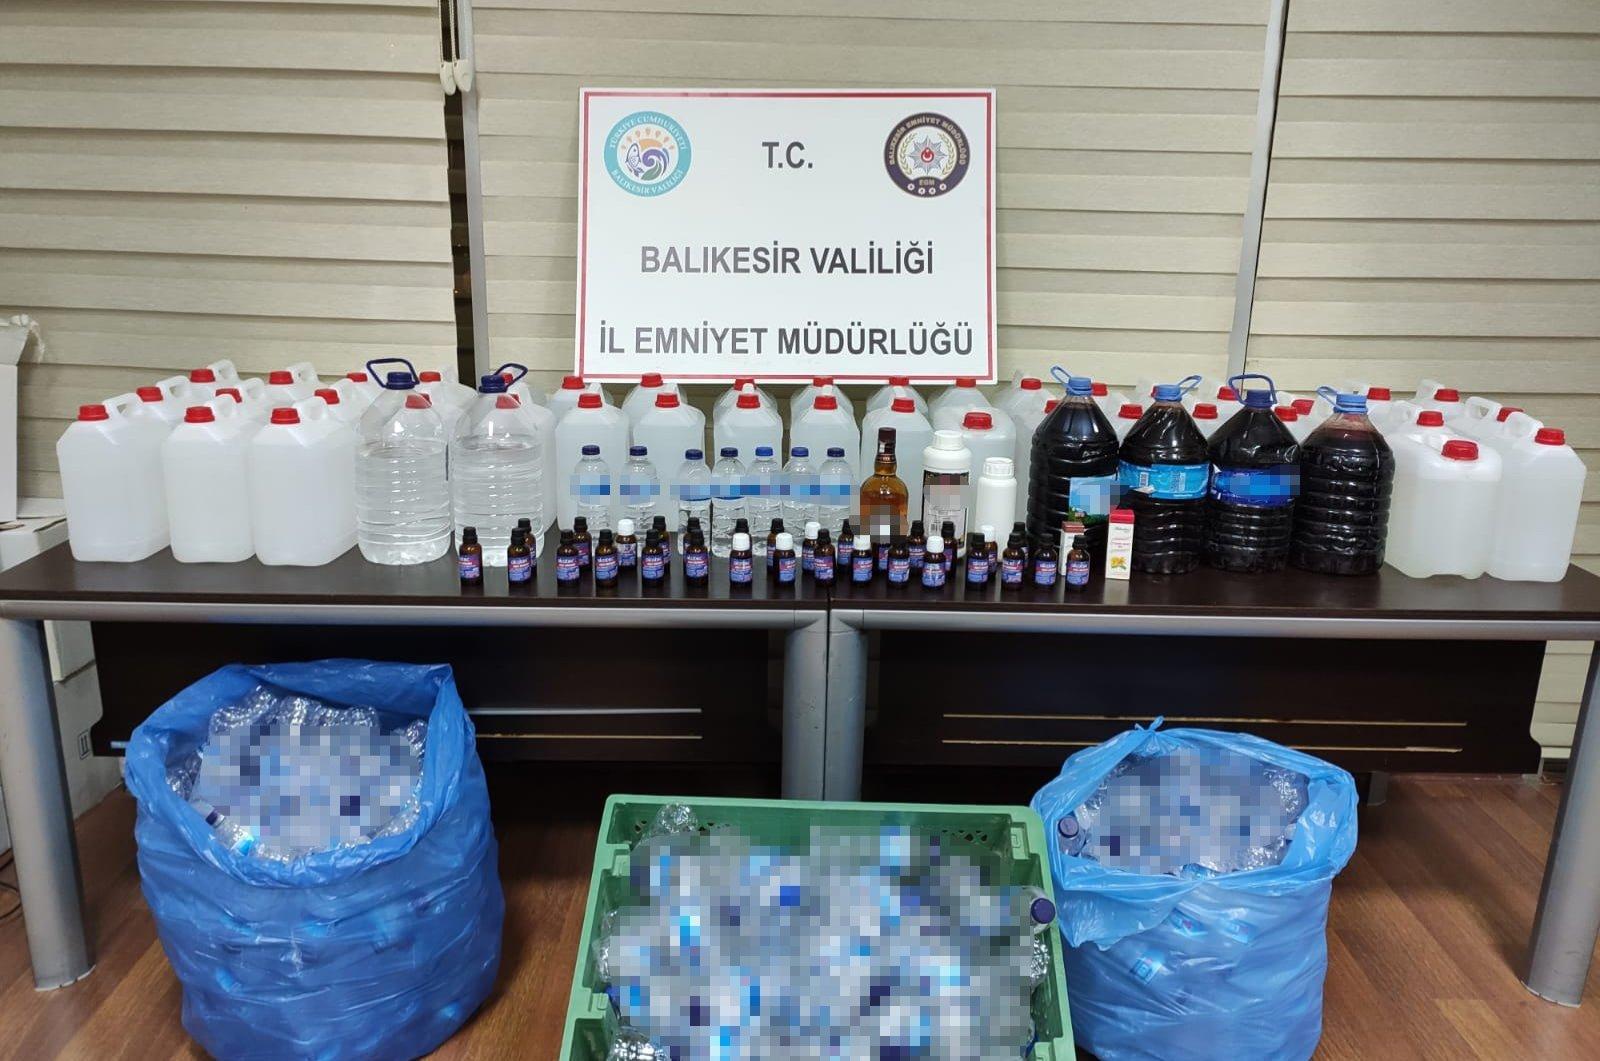 Police display bootleg alcohol seized in an operation in Balıkesir, western Turkey, Oct. 13, 2020. (AA Photo)